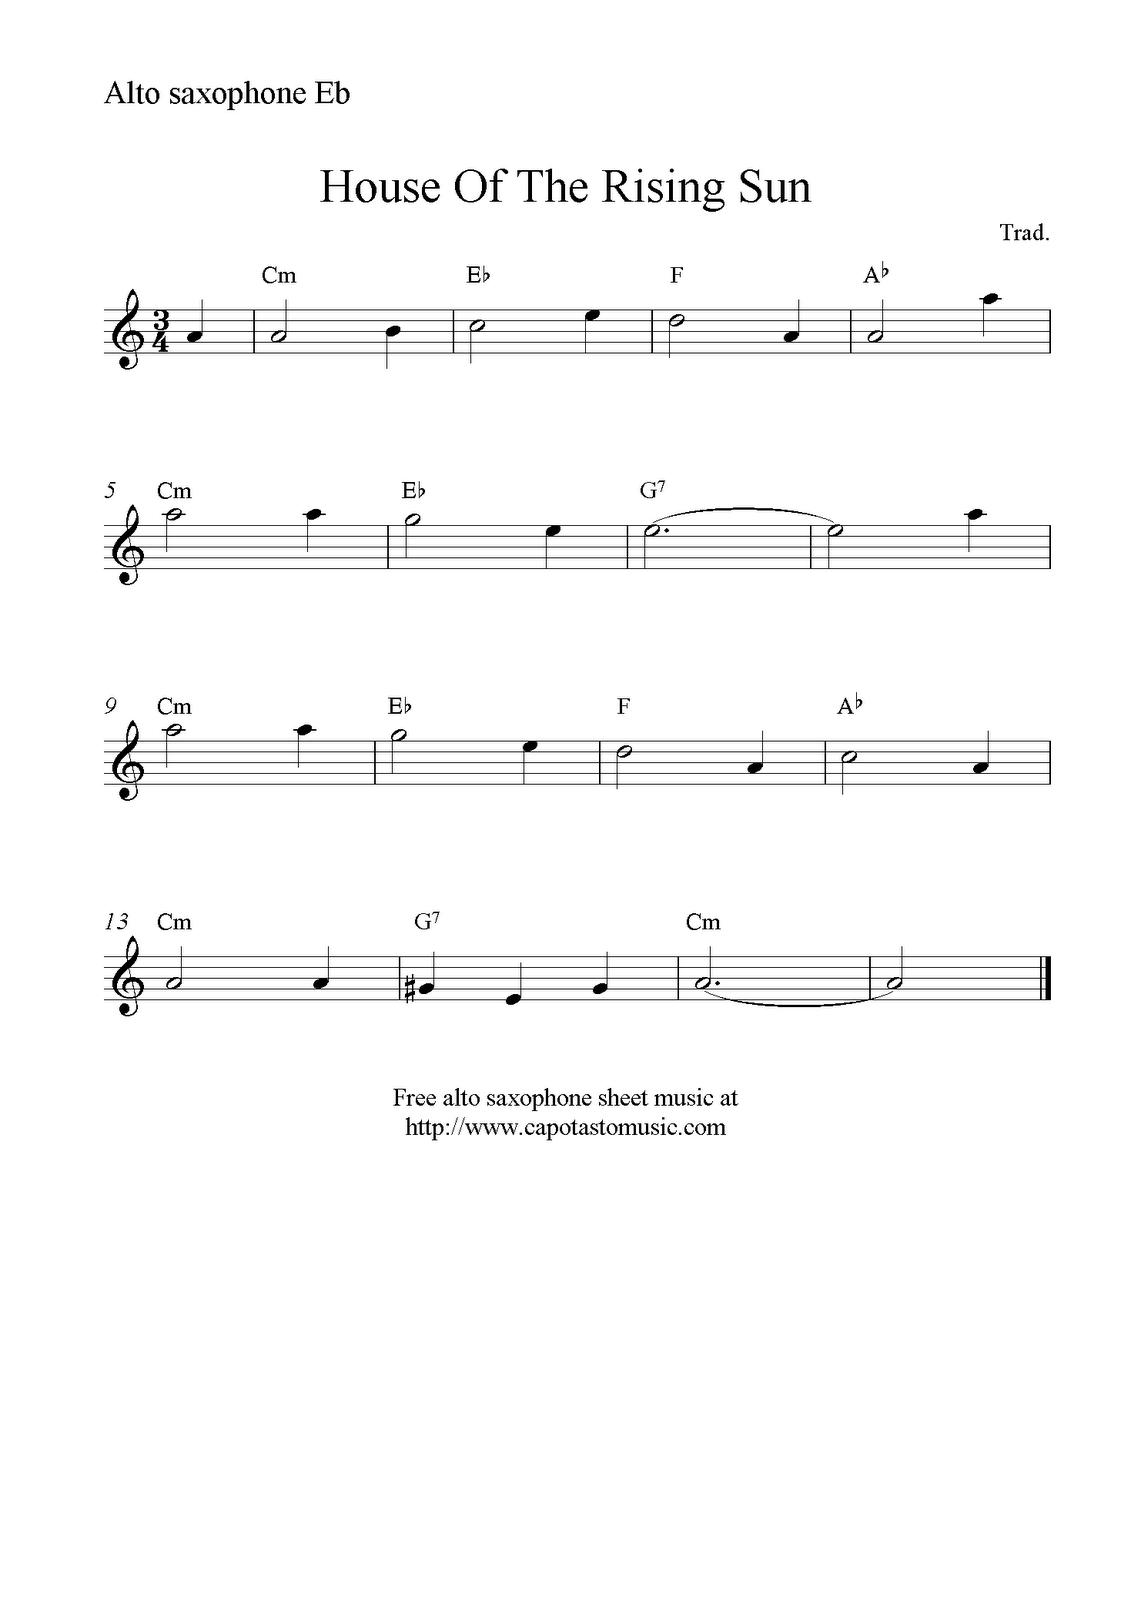 House Of The Rising Sun, Free Alto Saxophone Sheet Music Notes - Free Printable Alto Saxophone Sheet Music